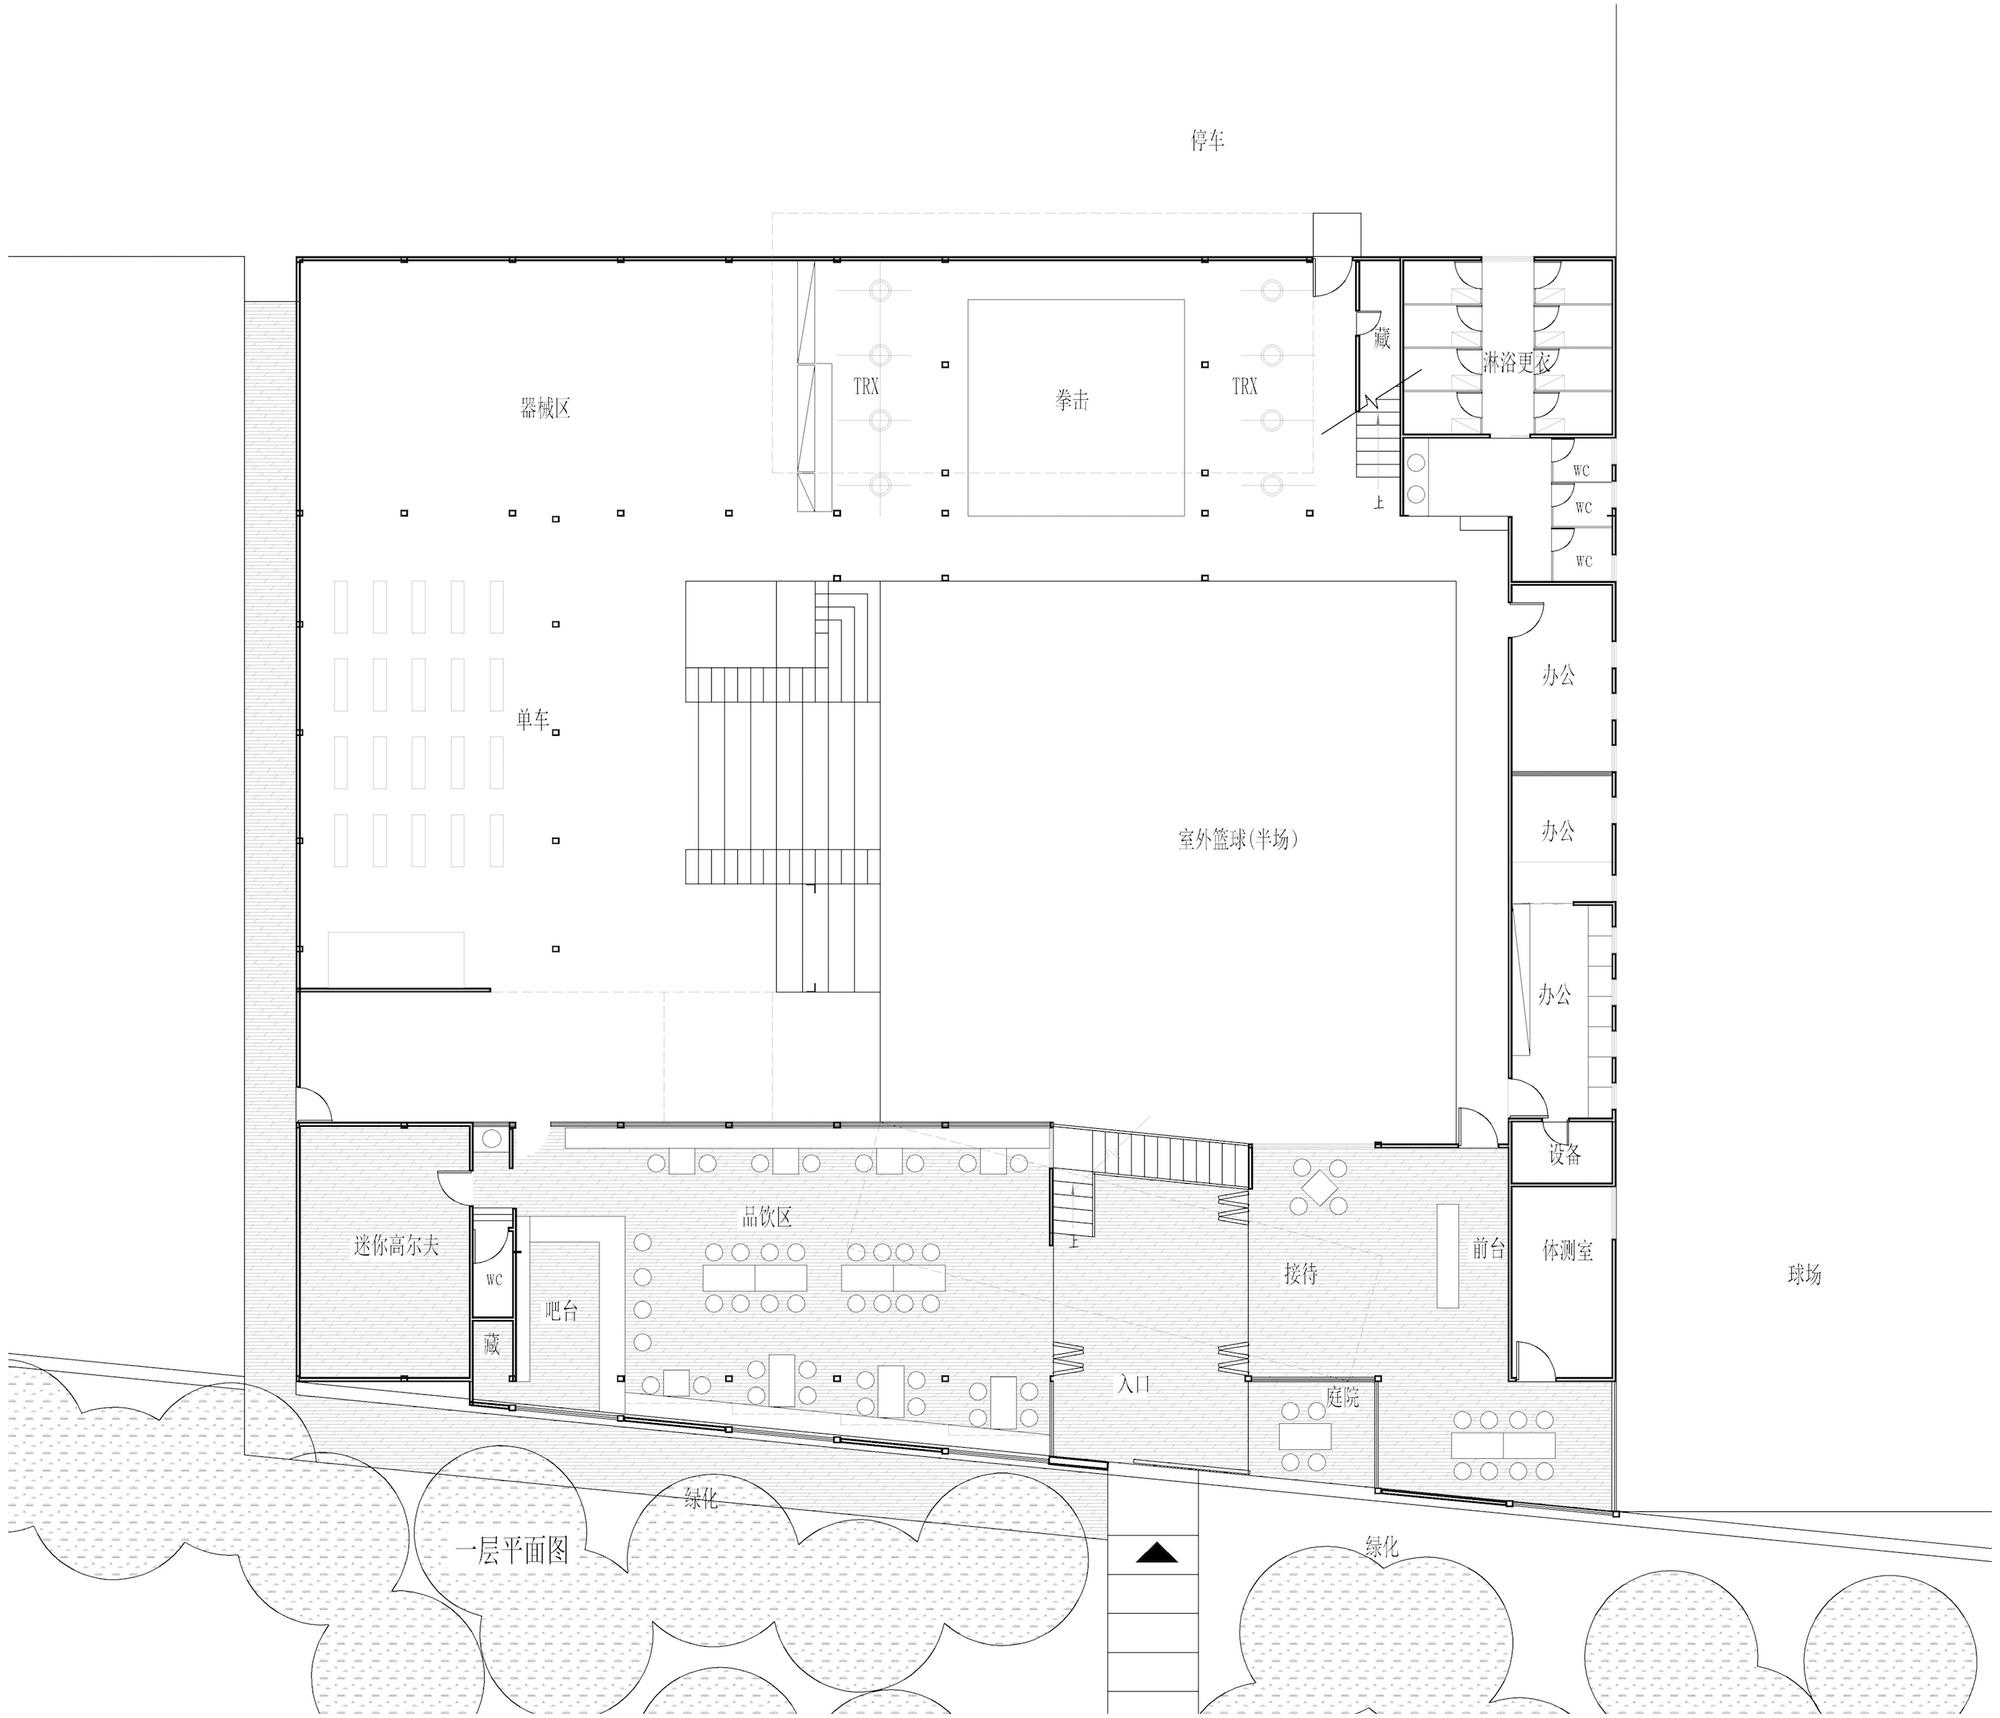 Gallery Of Undefined Black Box Gym Had Epos 17 Diagram Zoom Image View Original Size